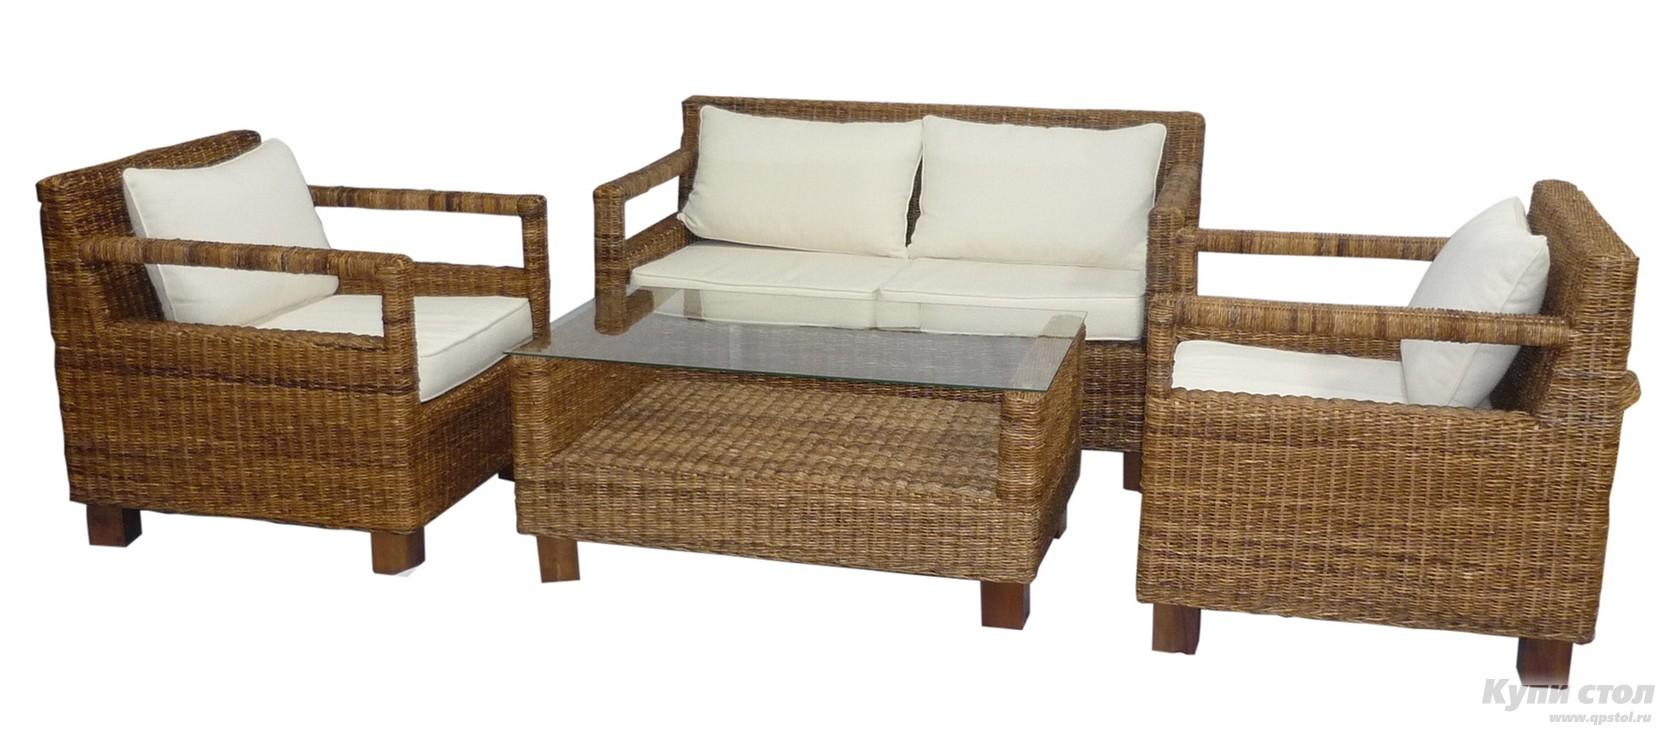 Комплект плетеной мебели Malaka КупиСтол.Ru 51740.000